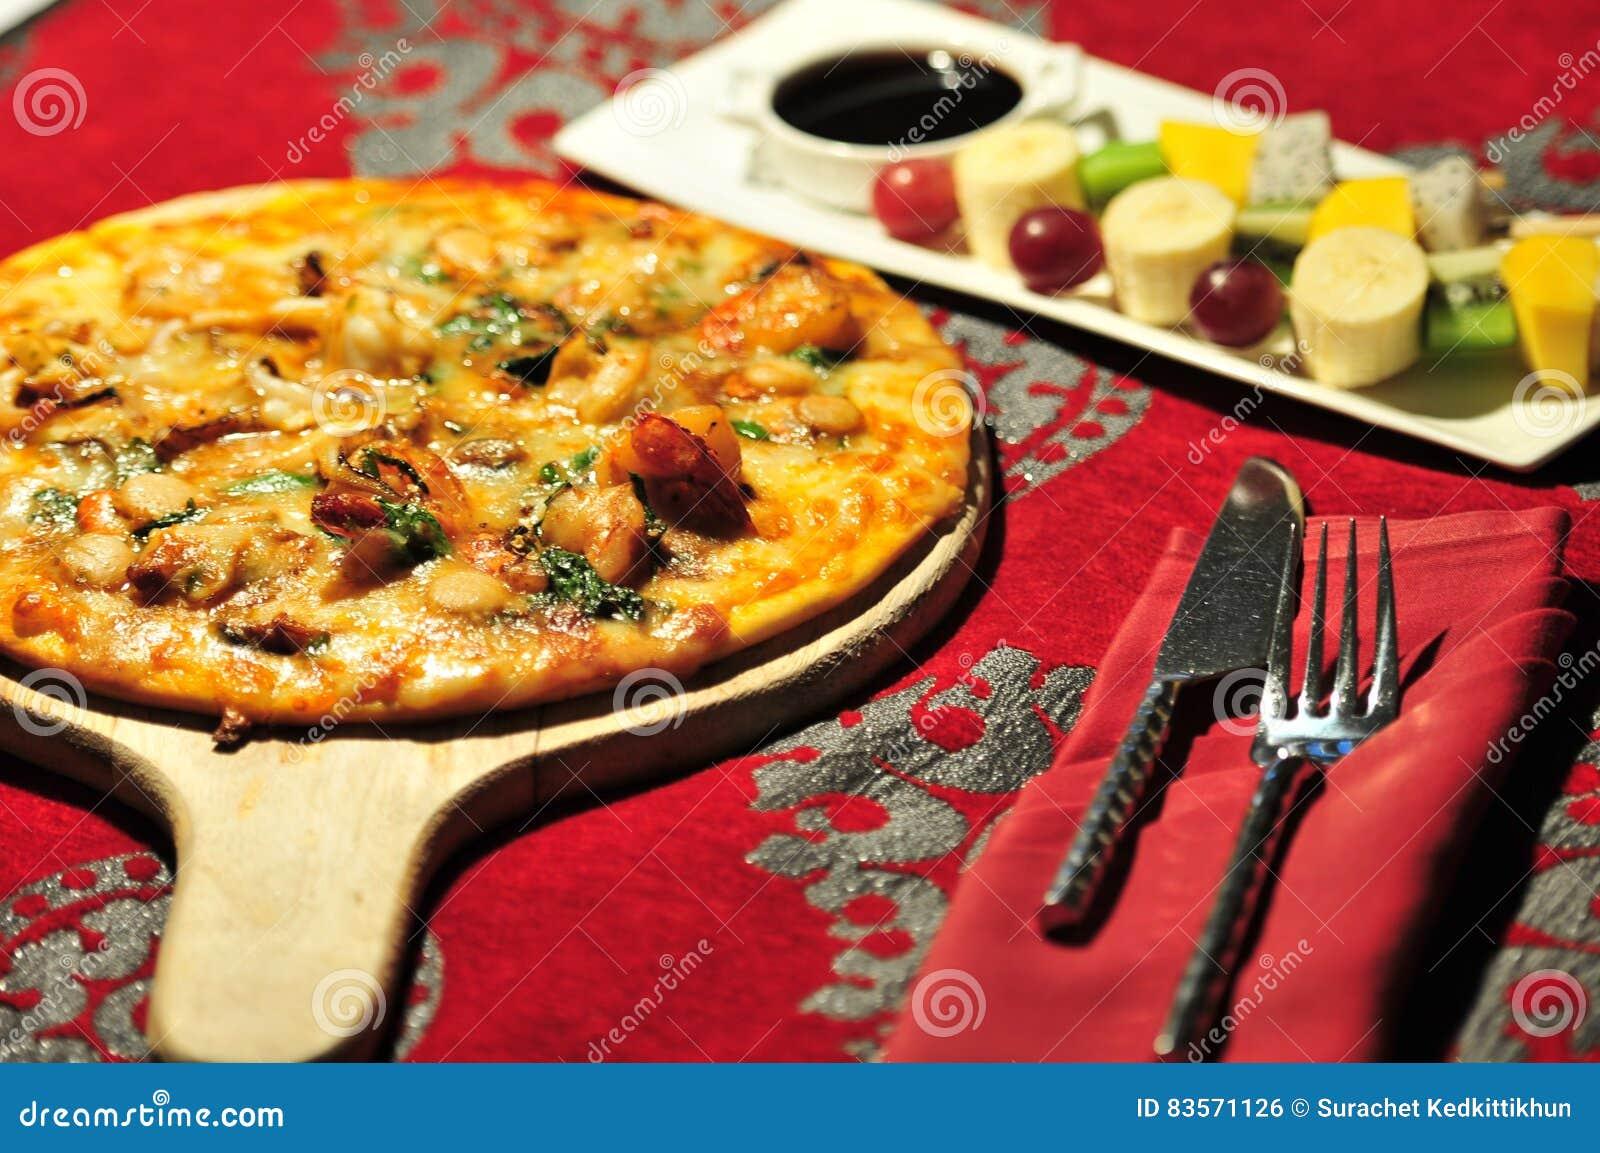 Italian food decoration stock photo image of homemade for Italian decoration food